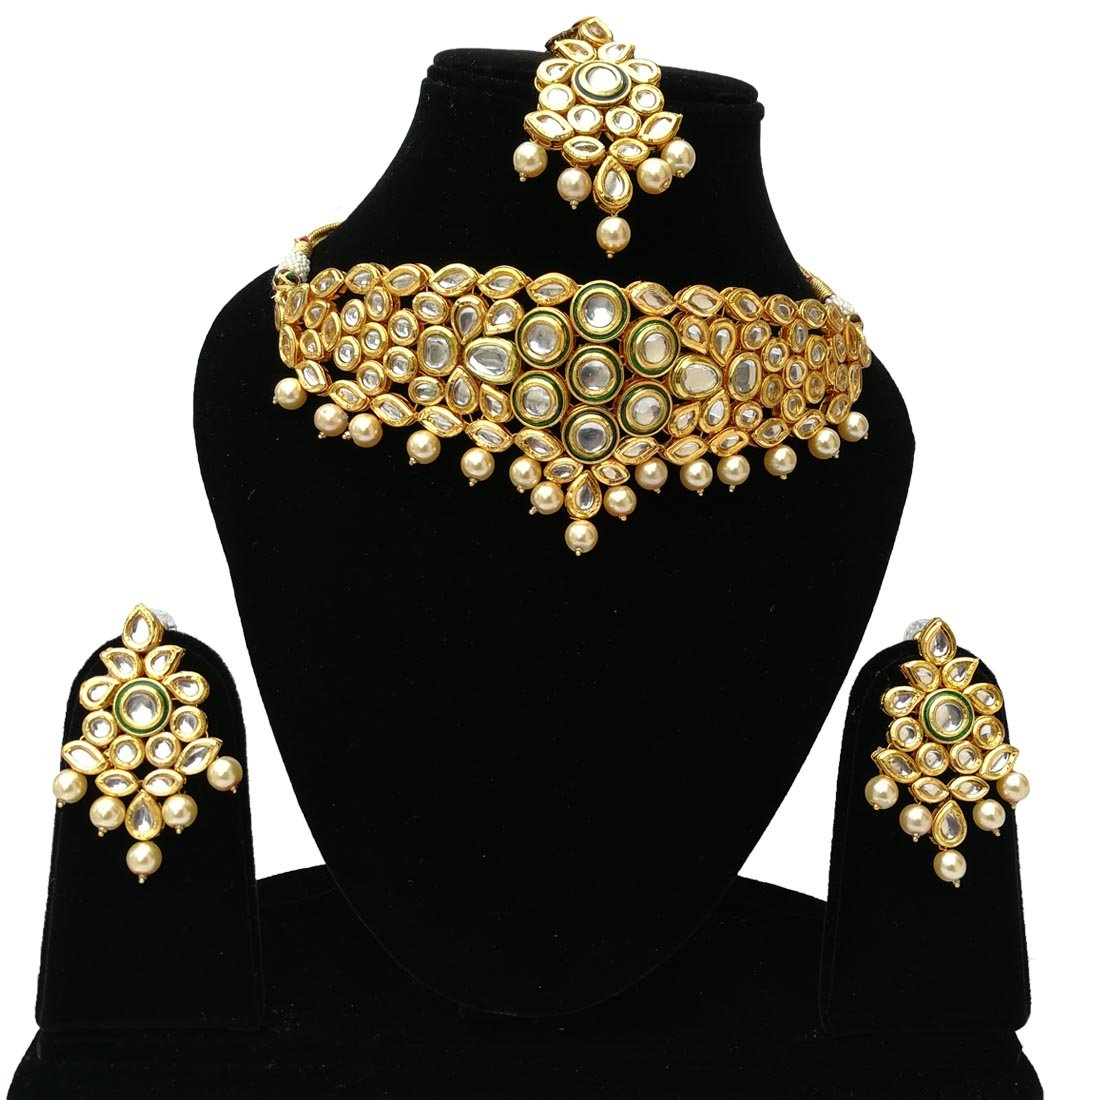 Fkraft Kundan Gold Plated Latest Wedding Necklace Jewelry Set for Women Self Handmade FMK-GLD062